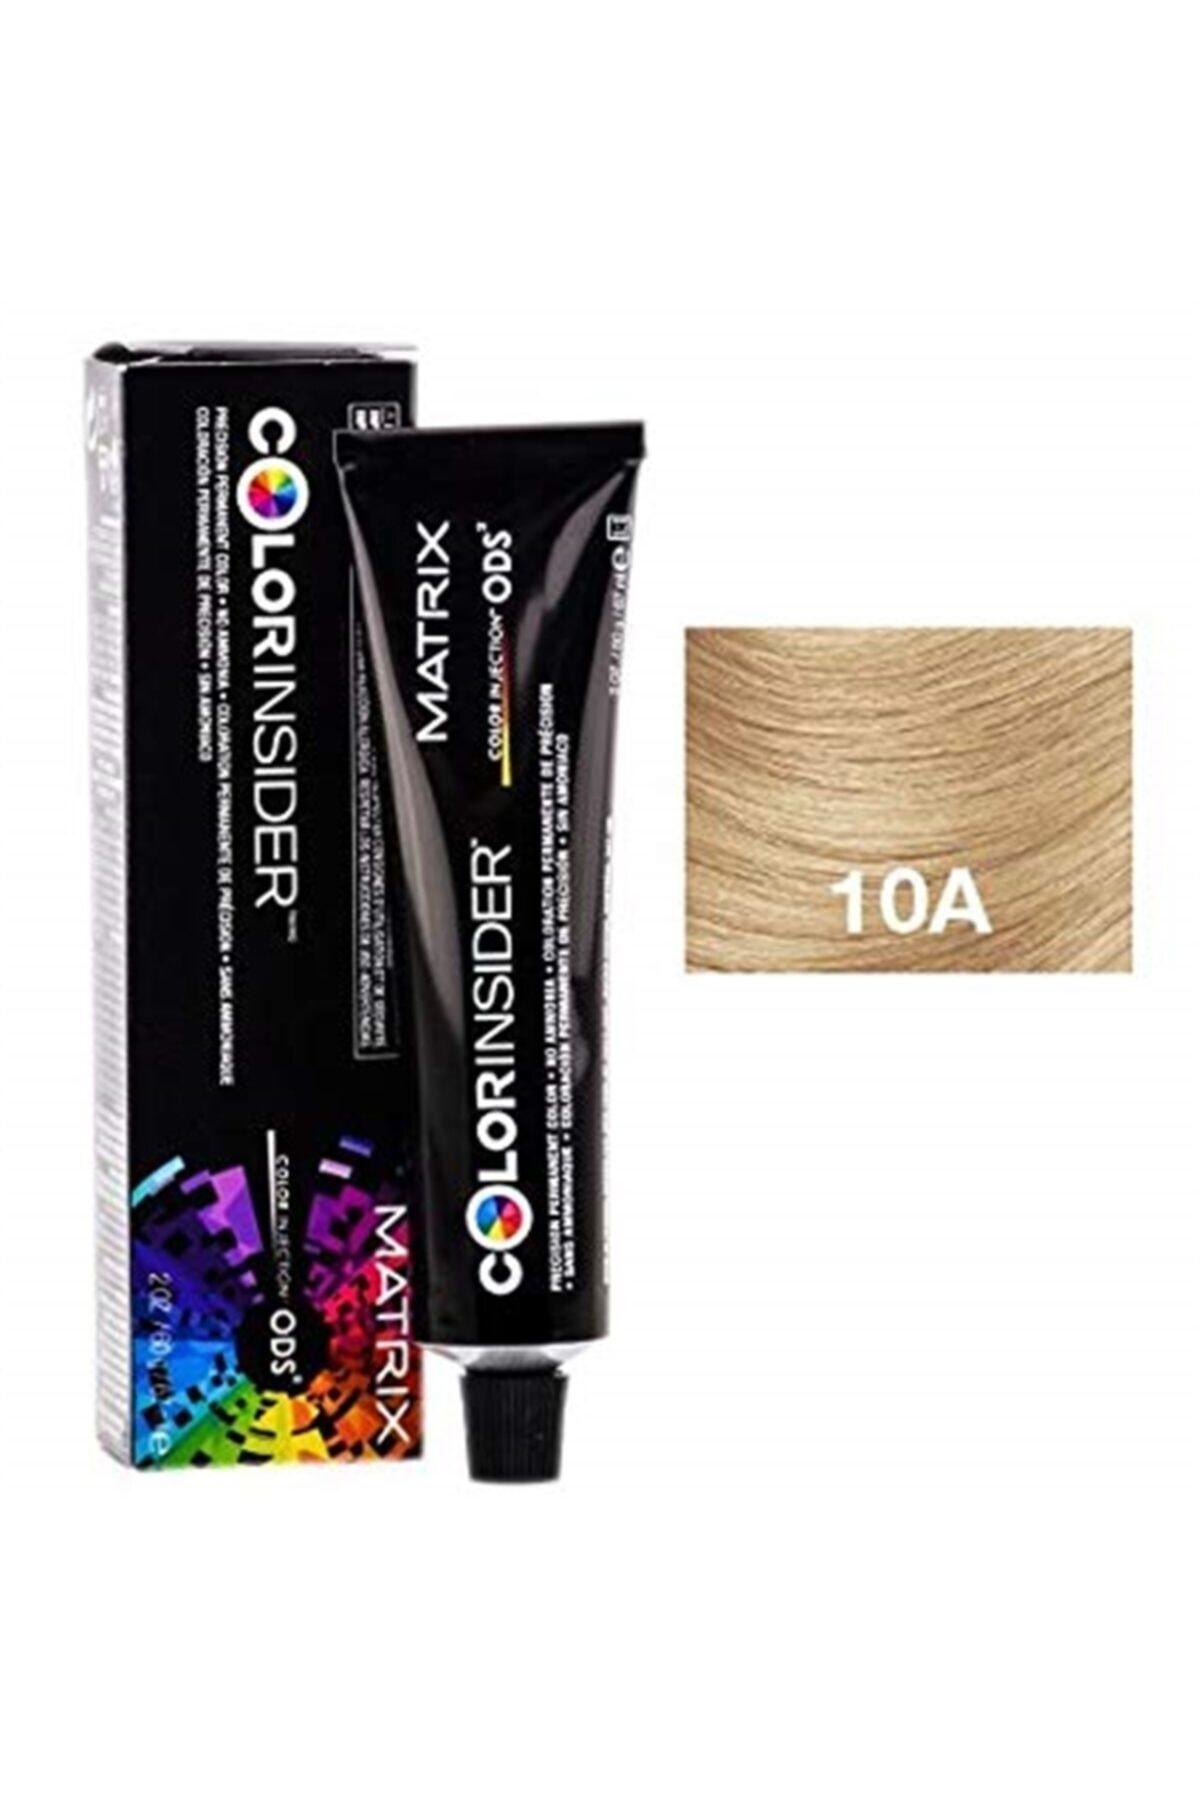 Matrix Color Insider Saç Boyası 10a Extra Light Blonde Ash 1